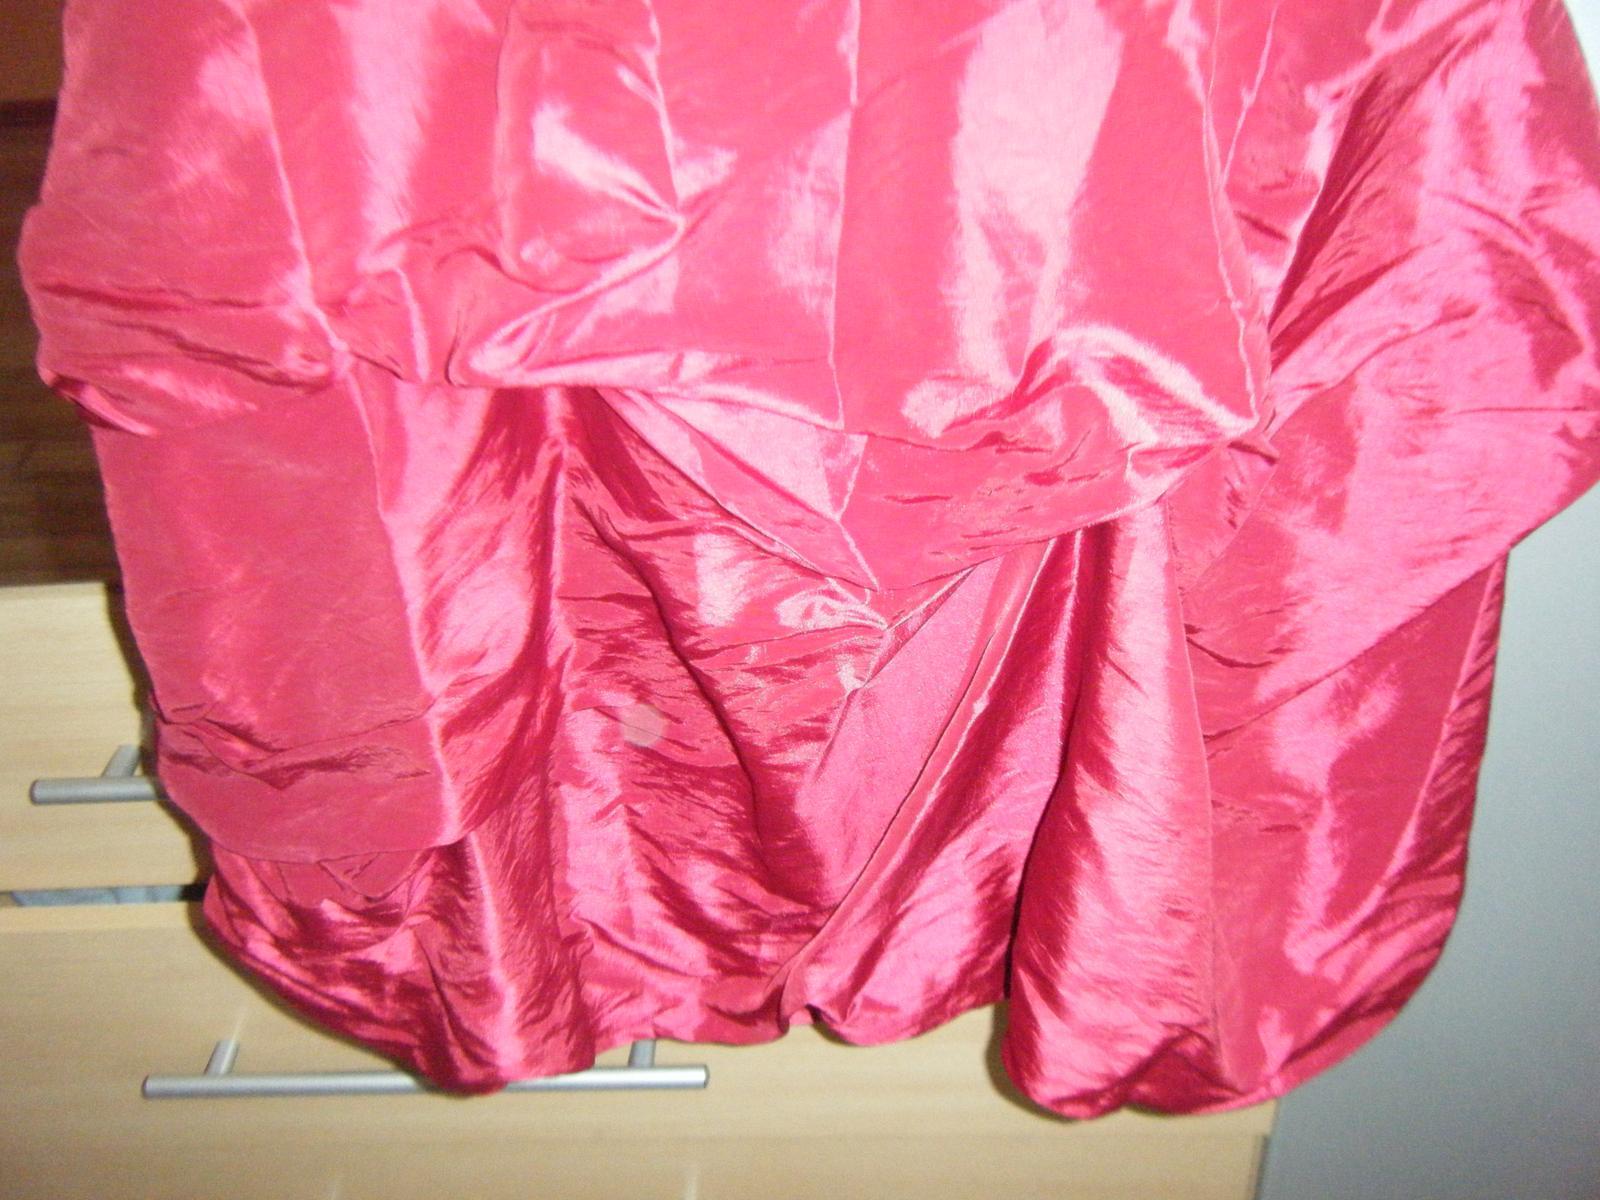 suknovy kostym - Obrázok č. 3